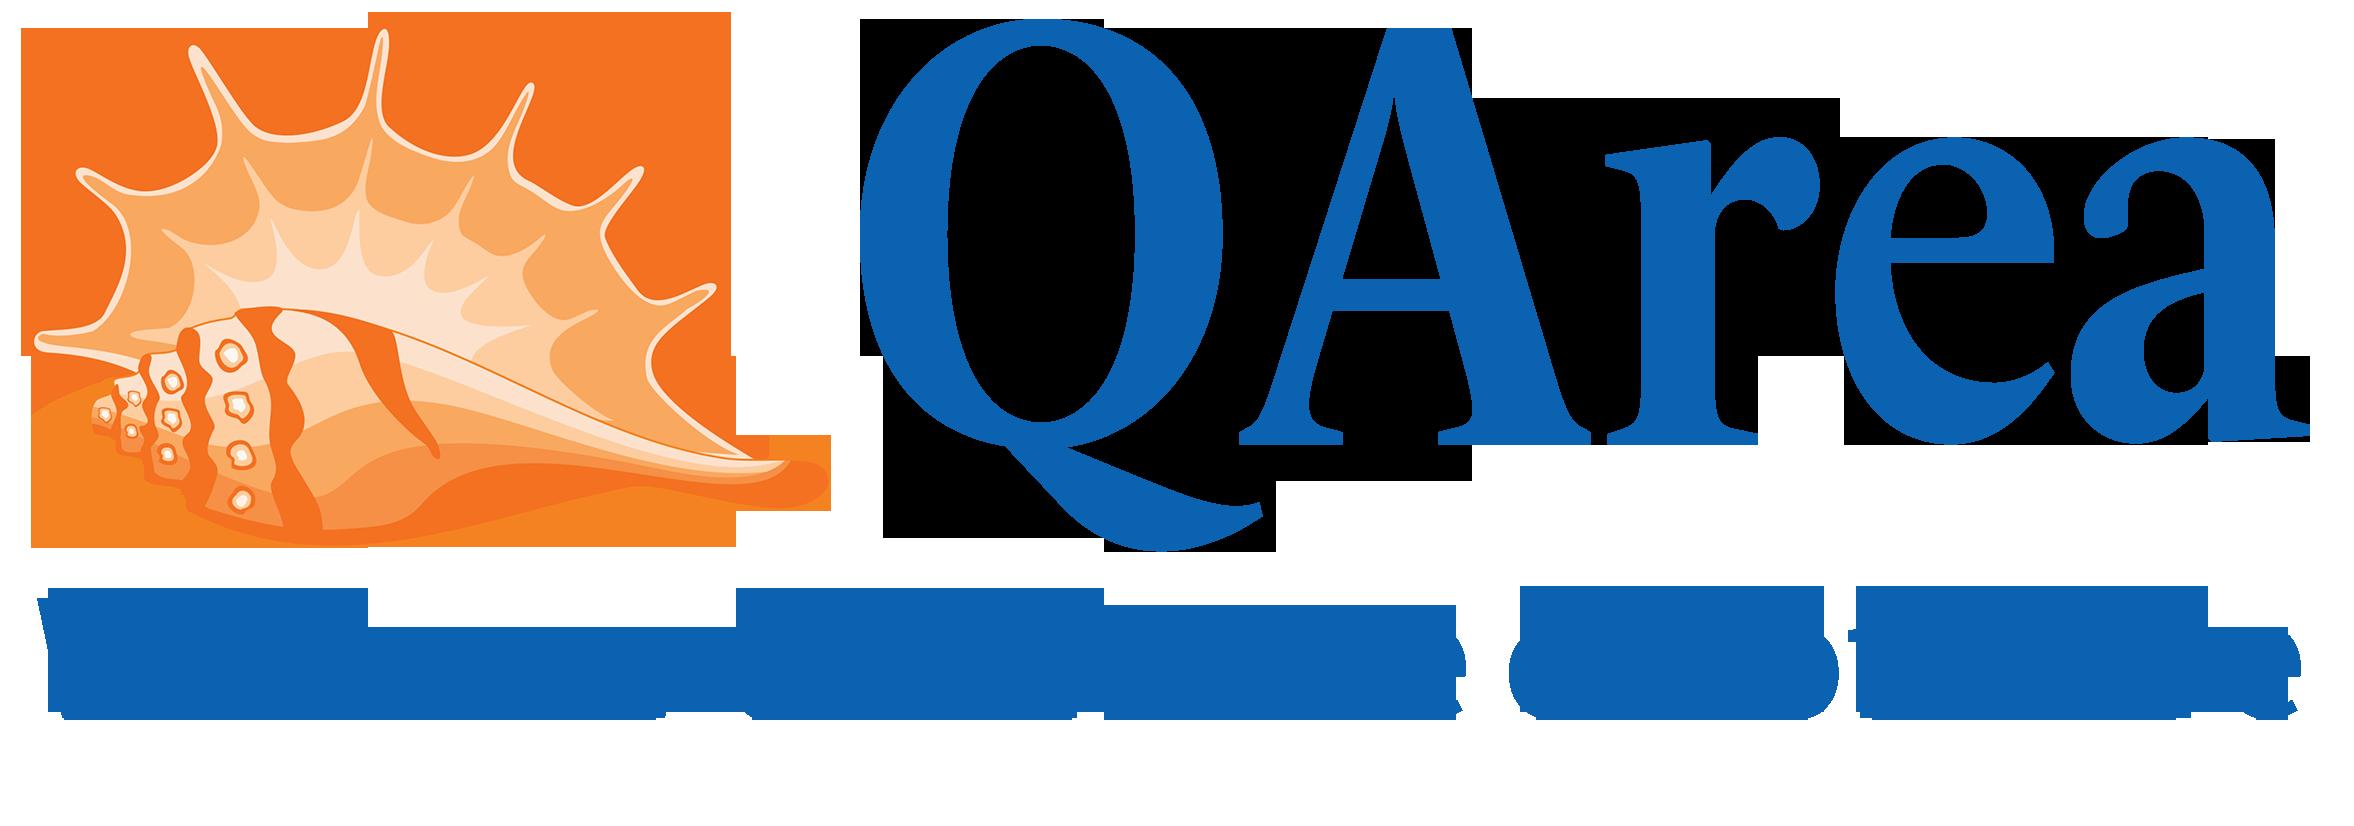 qarea-logo